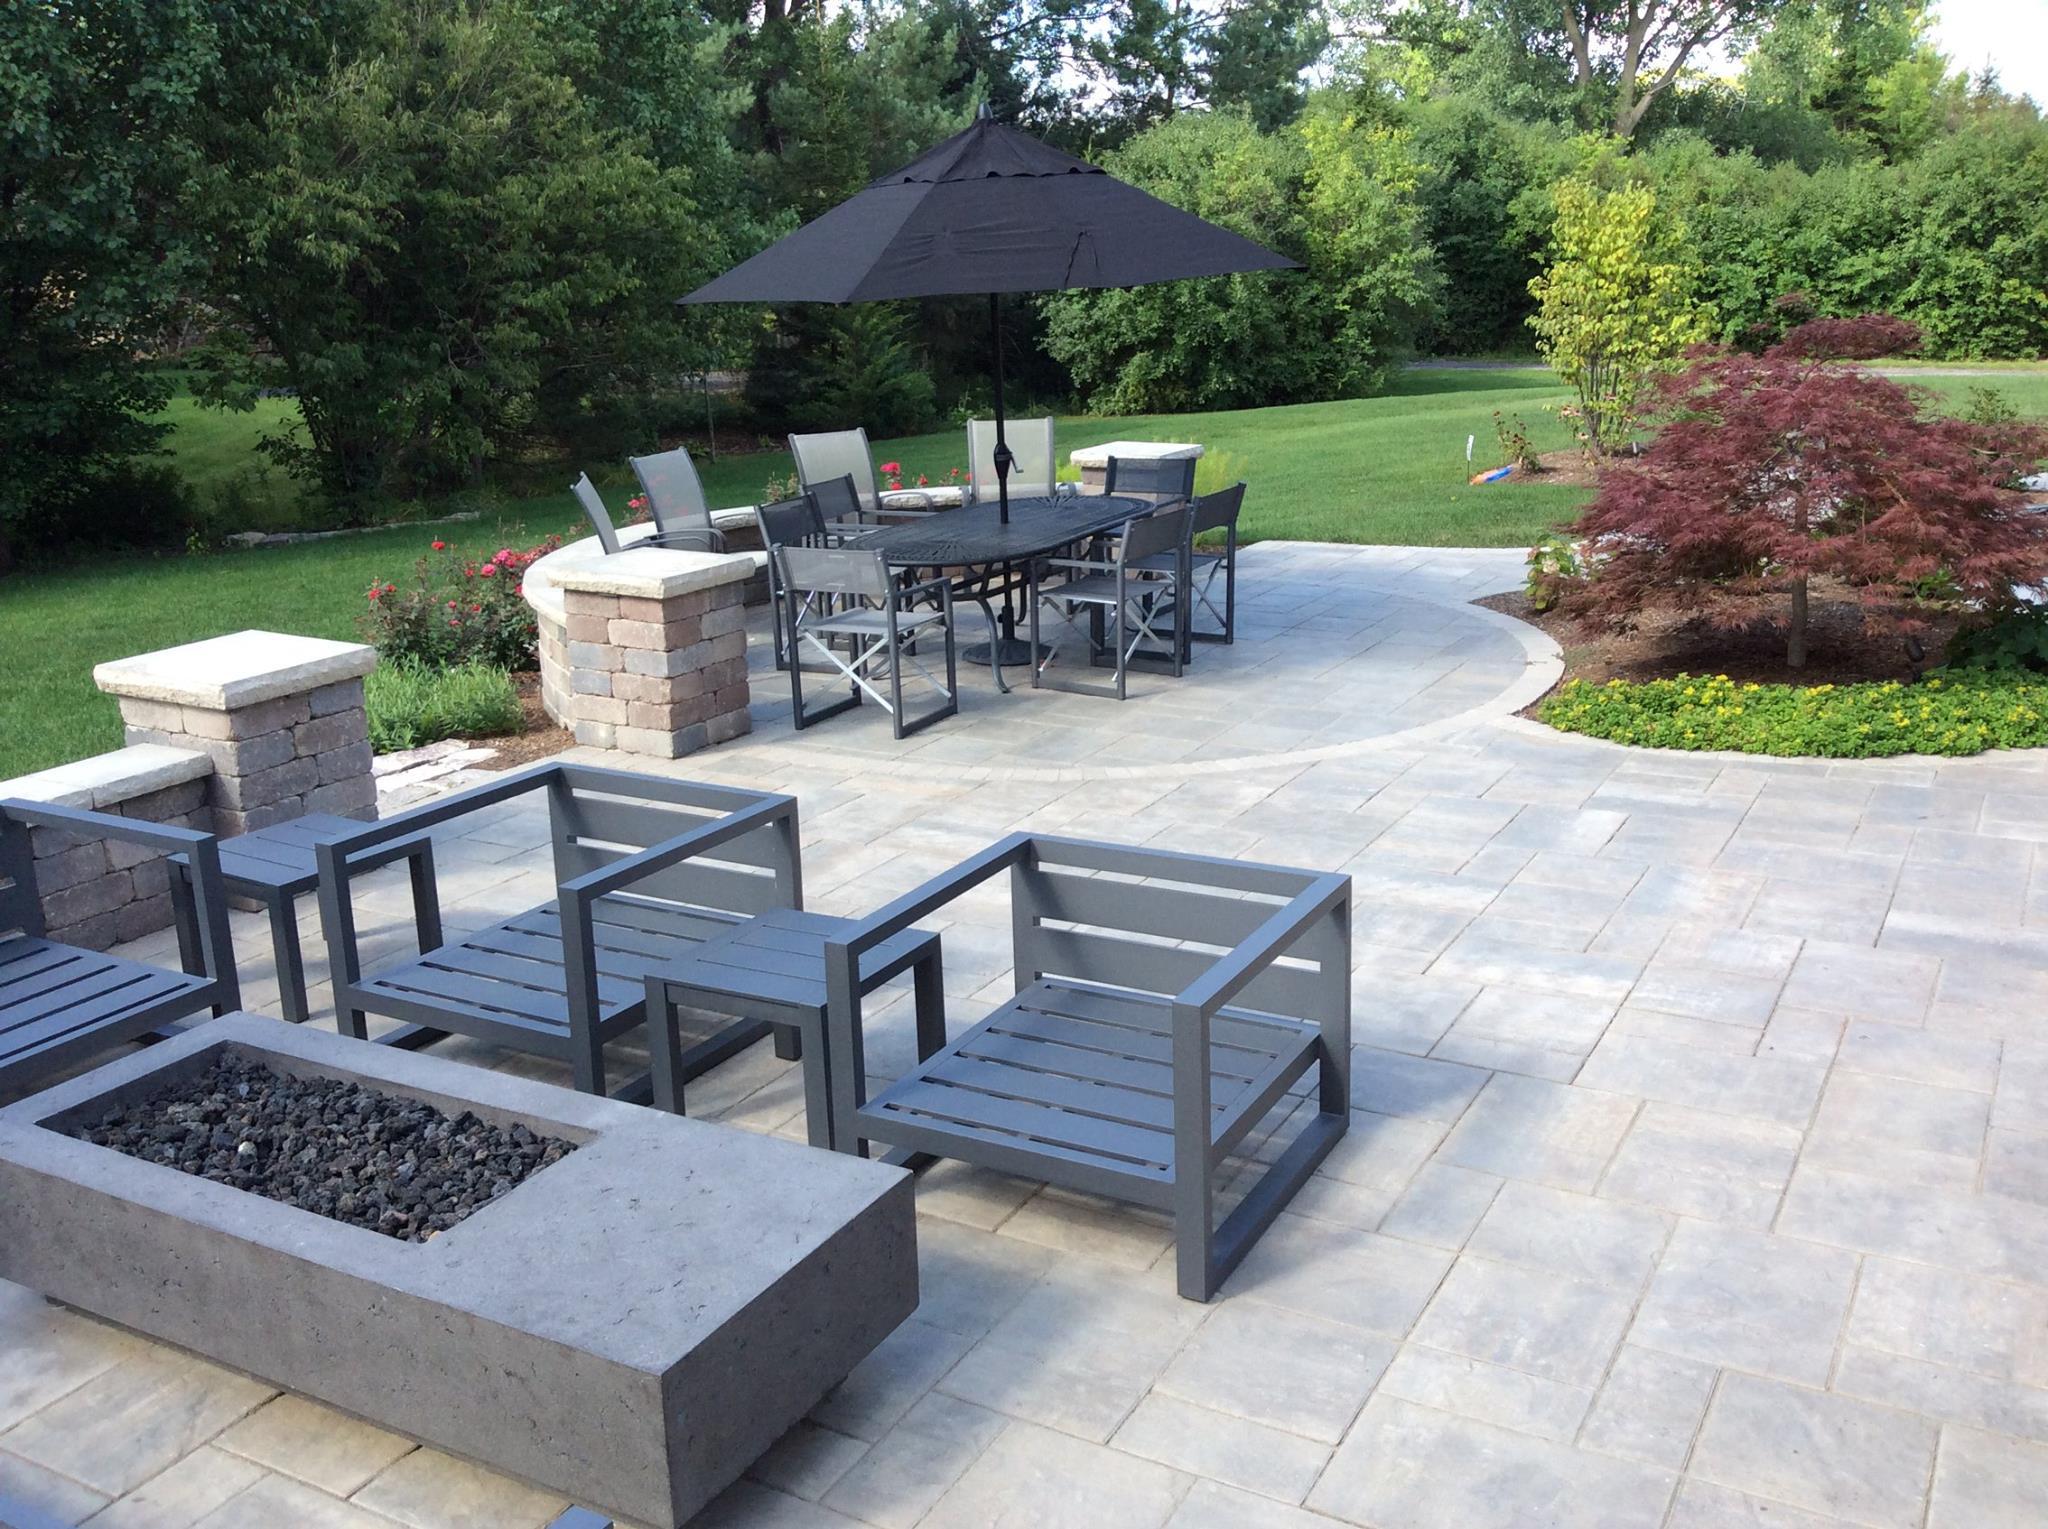 Top quality brick patio in Glen Ellyn, Illinois